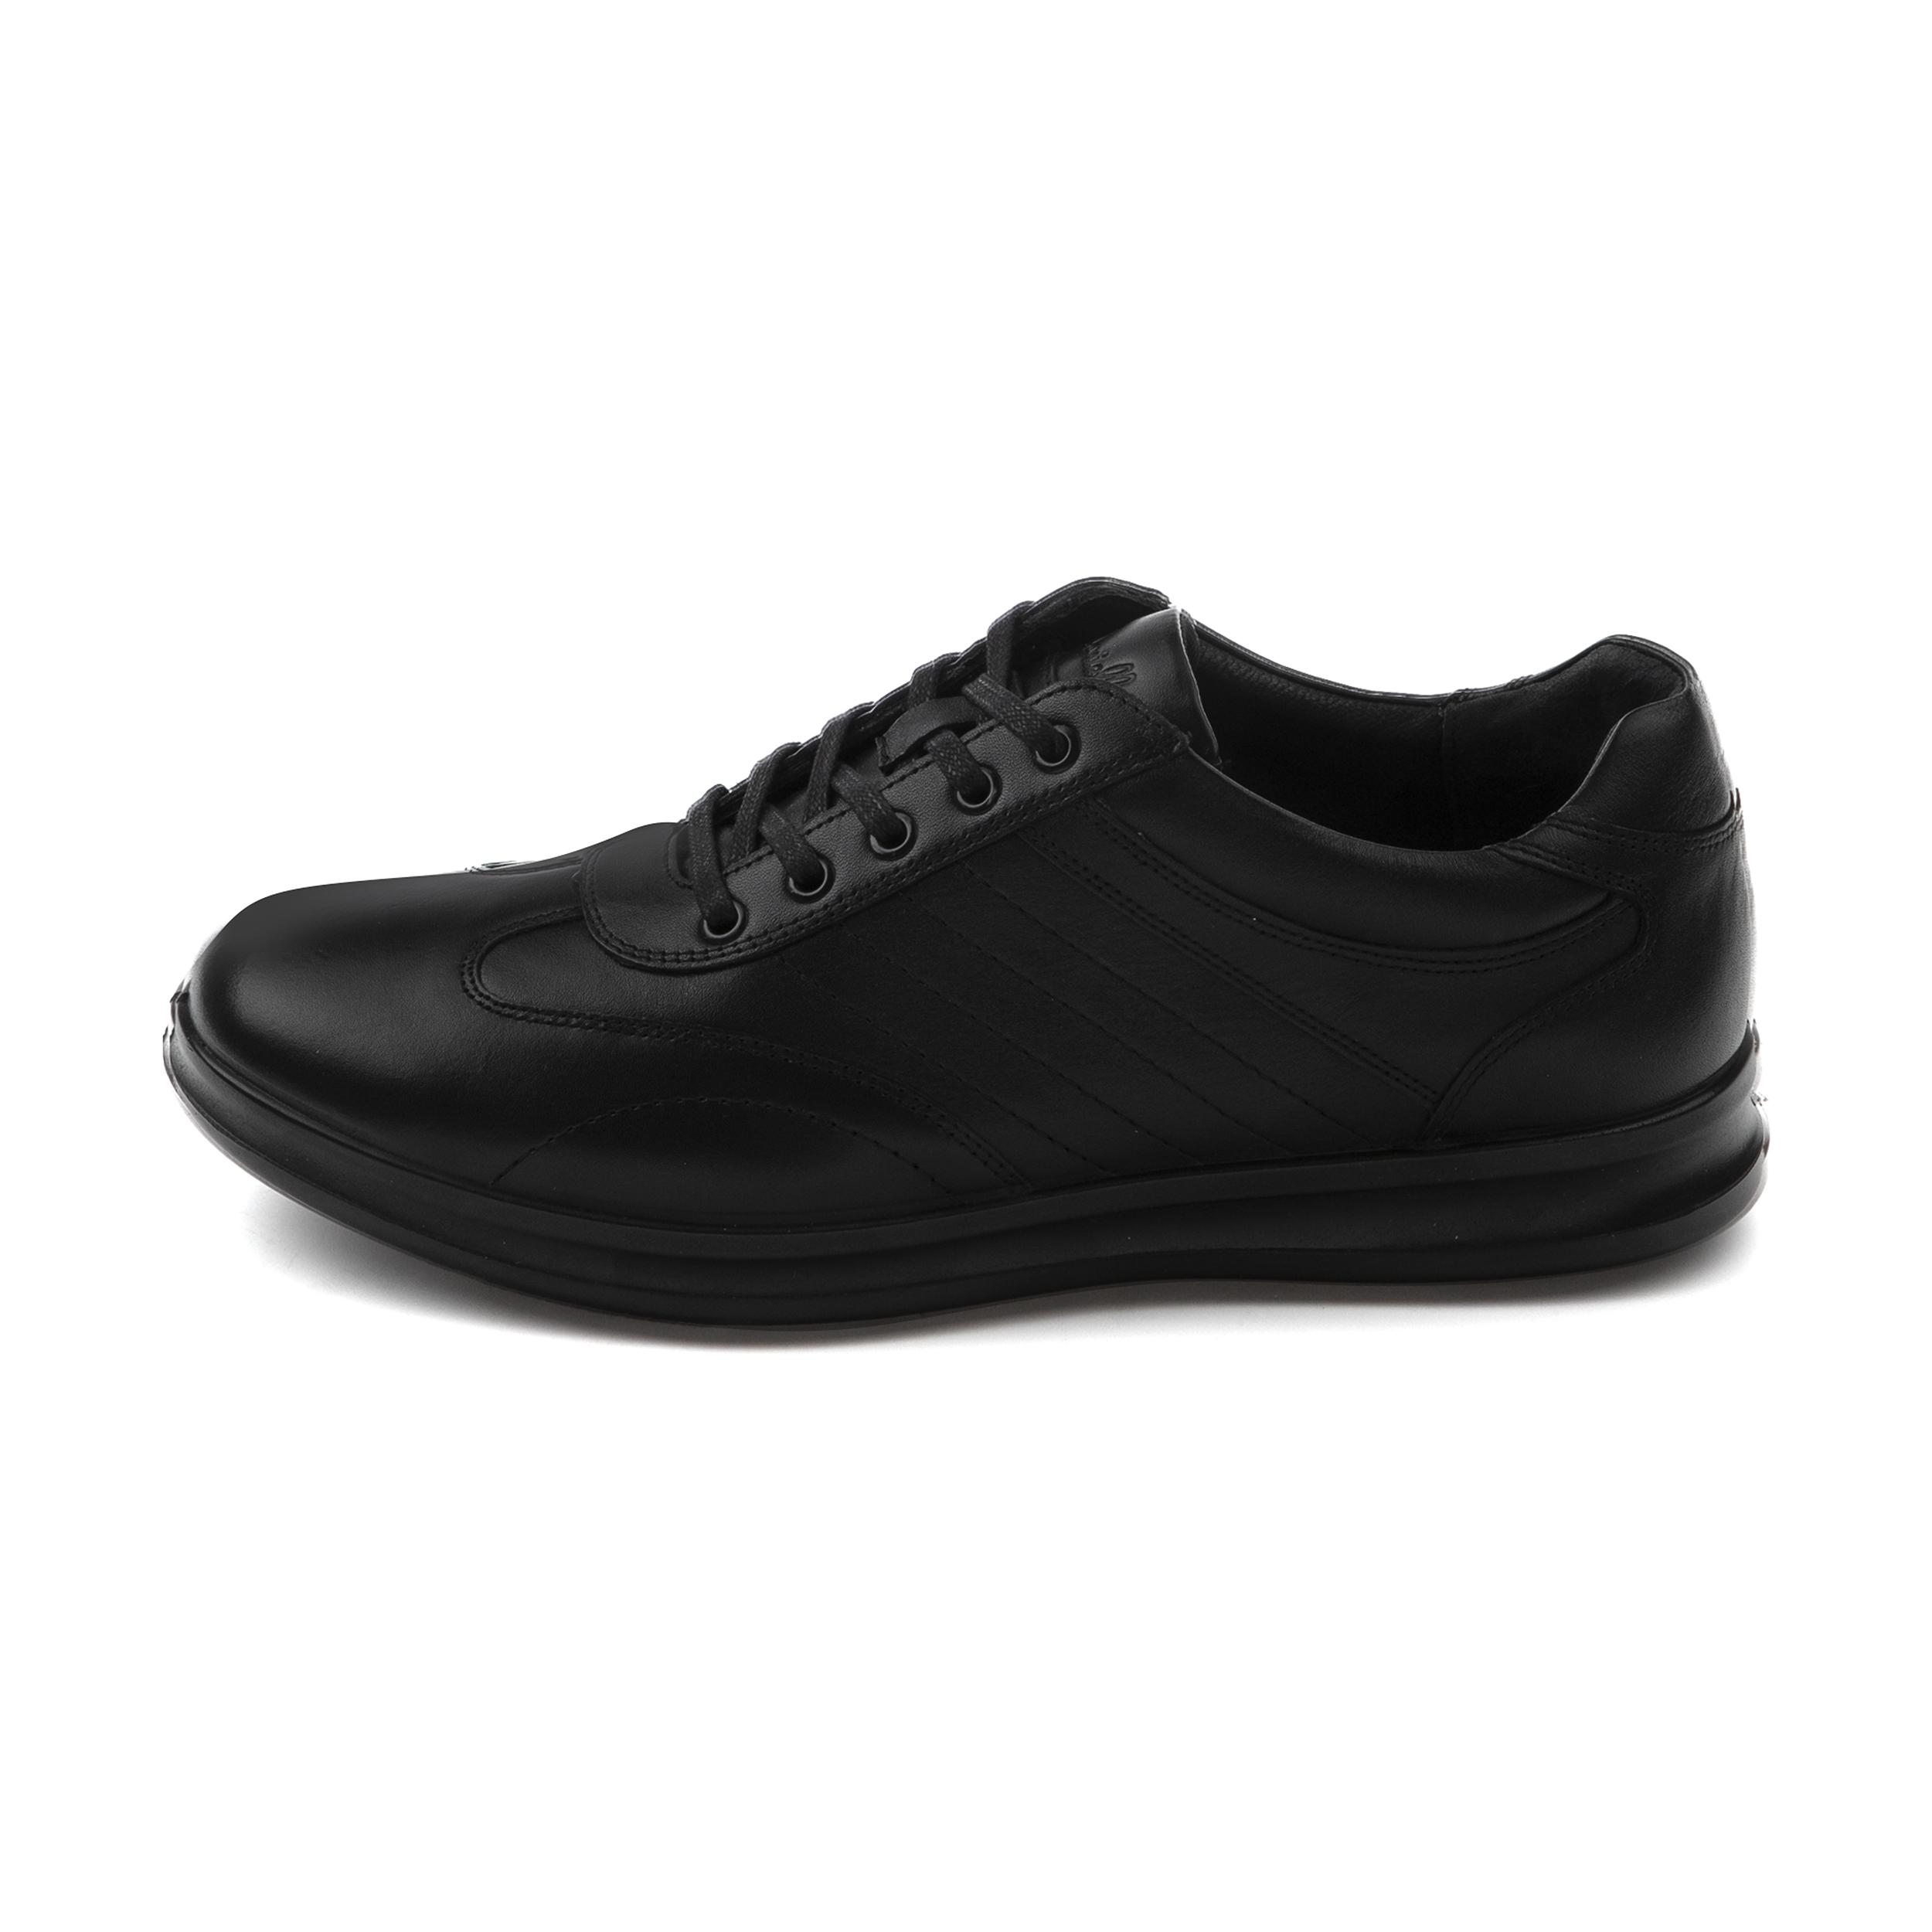 کفش روزمره مردانه دنیلی مدل Artman-213070311001